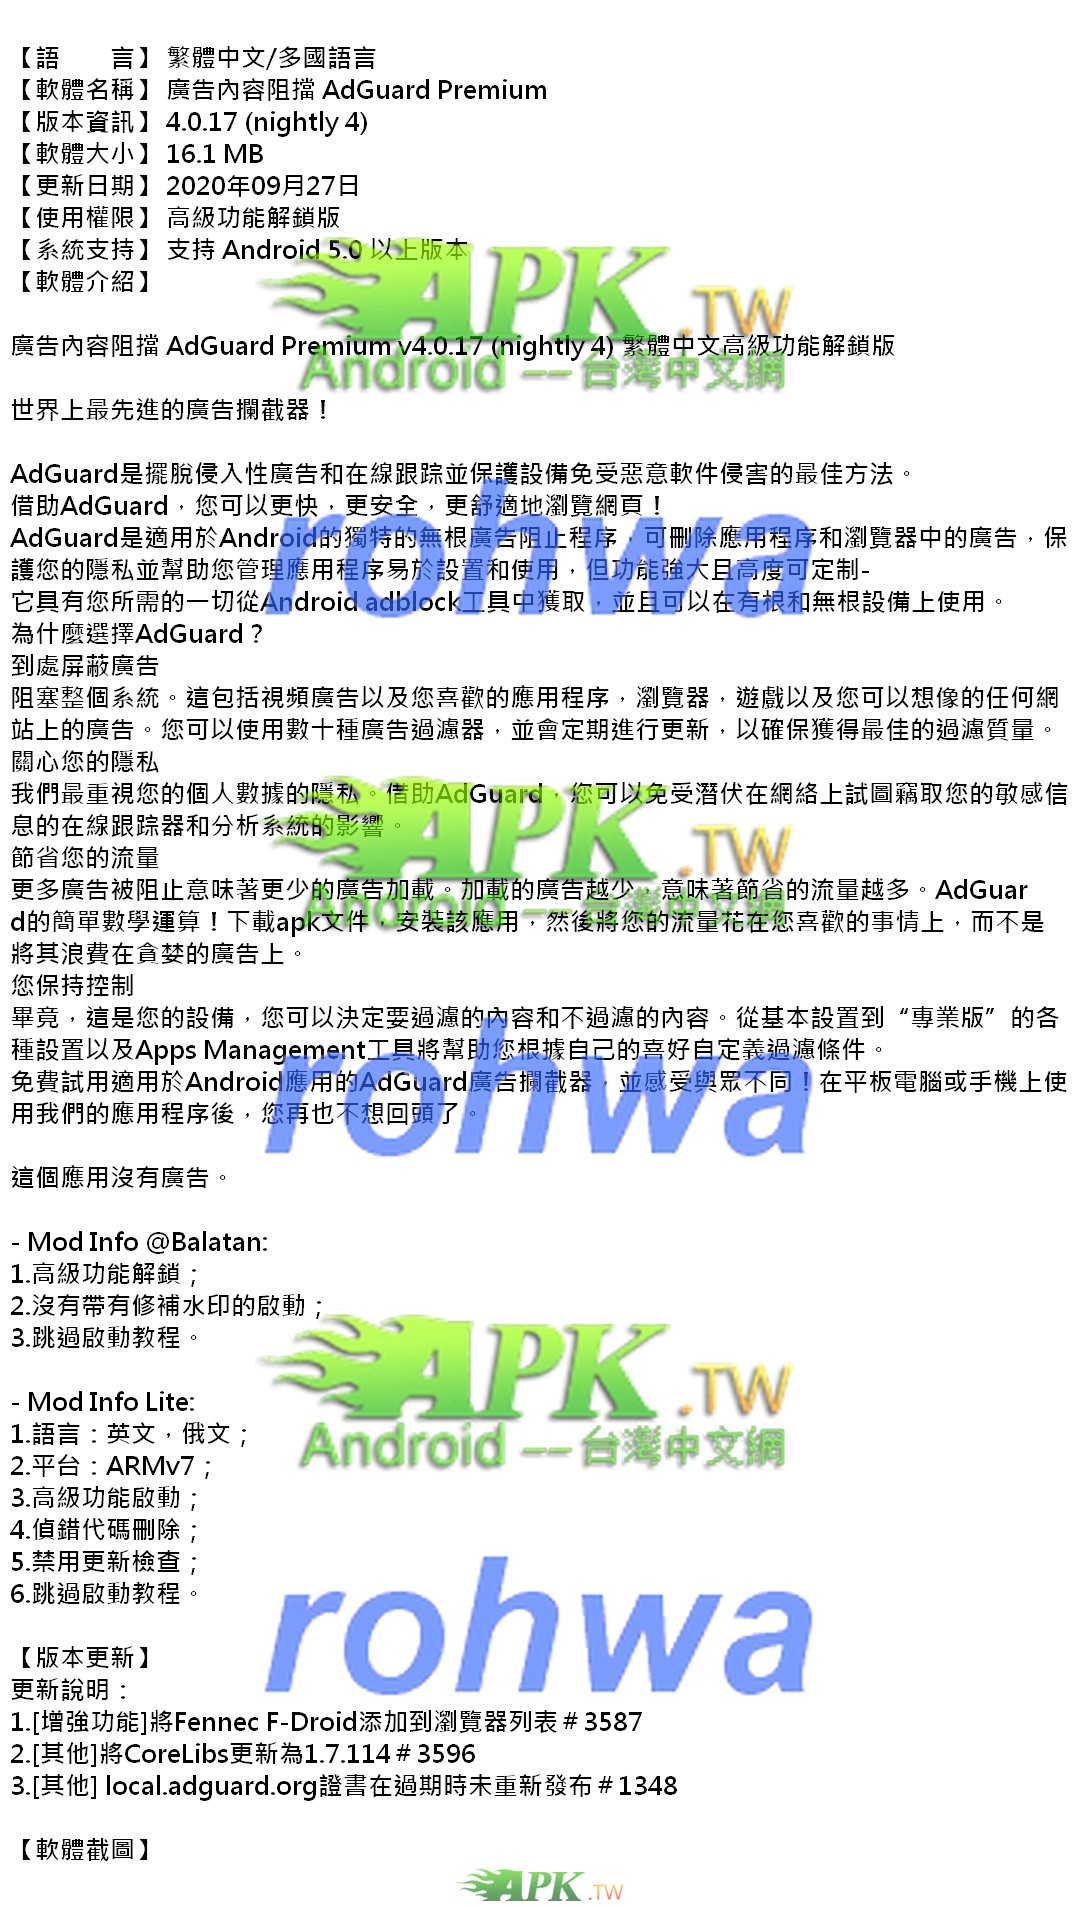 AdGuard_Premium_4.0.17_nightly4_.jpg